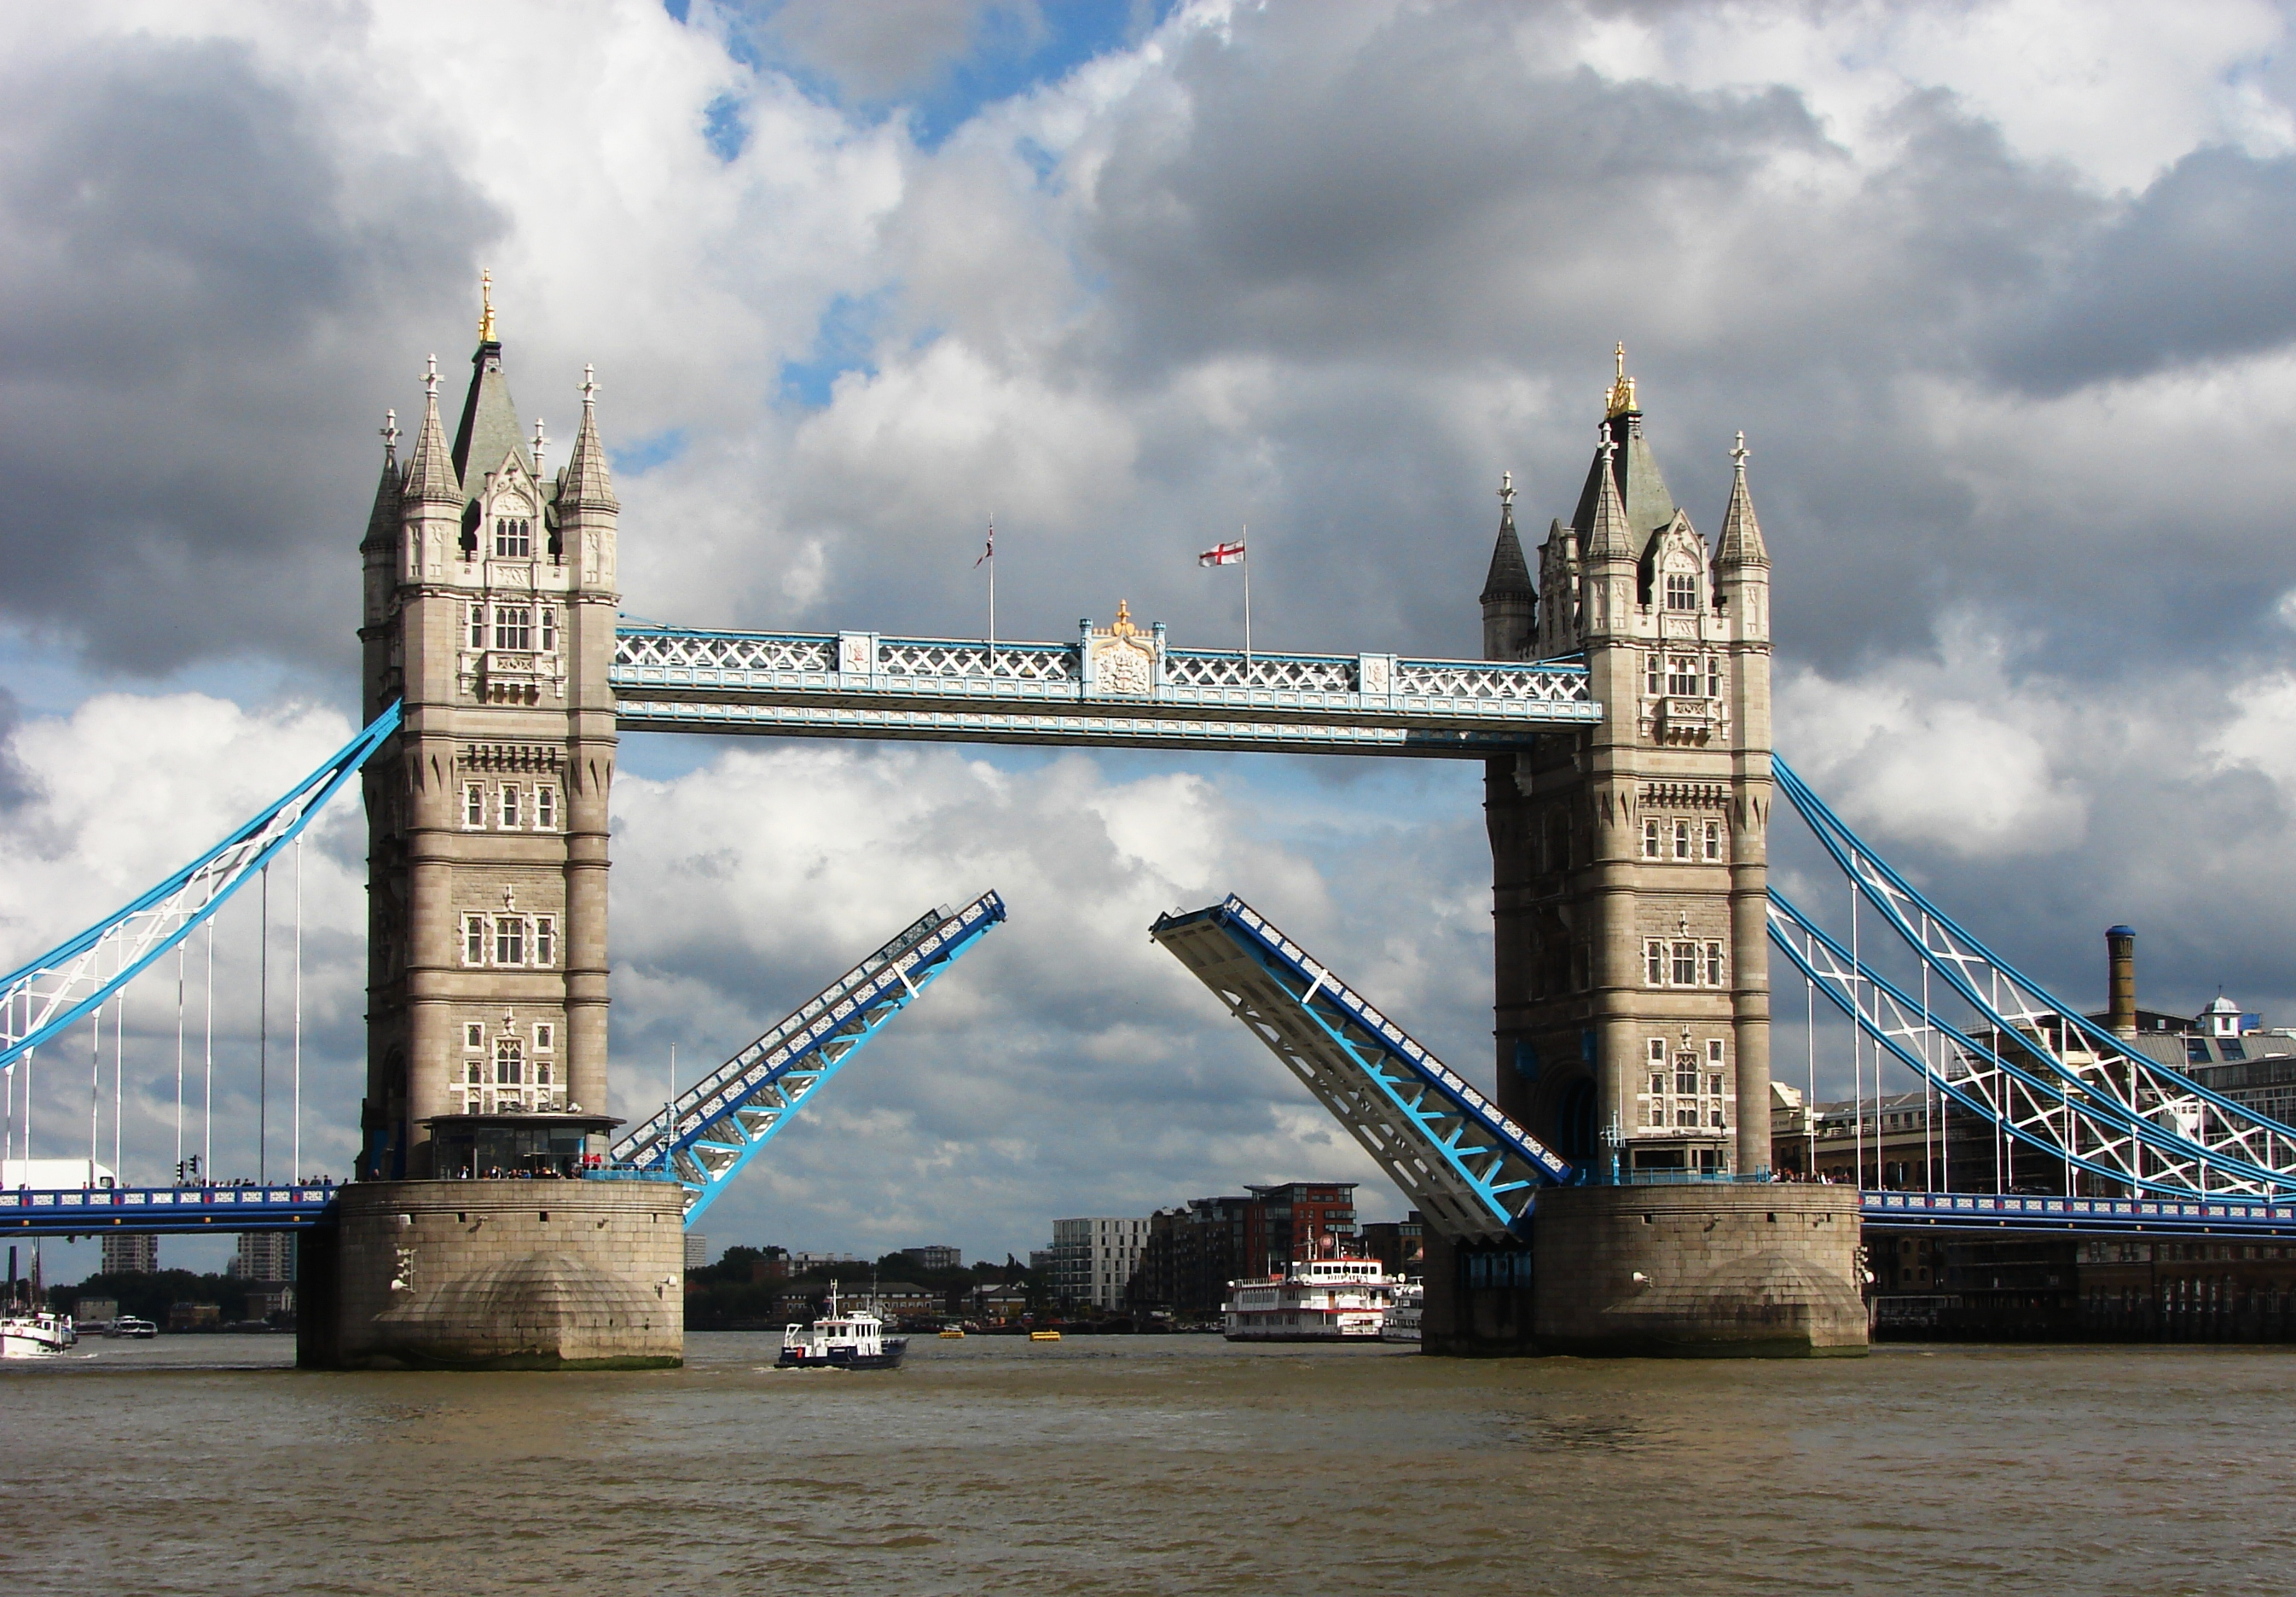 File:Tower Bridge,London Getting Opened 5.jpg - Wikimedia Commons